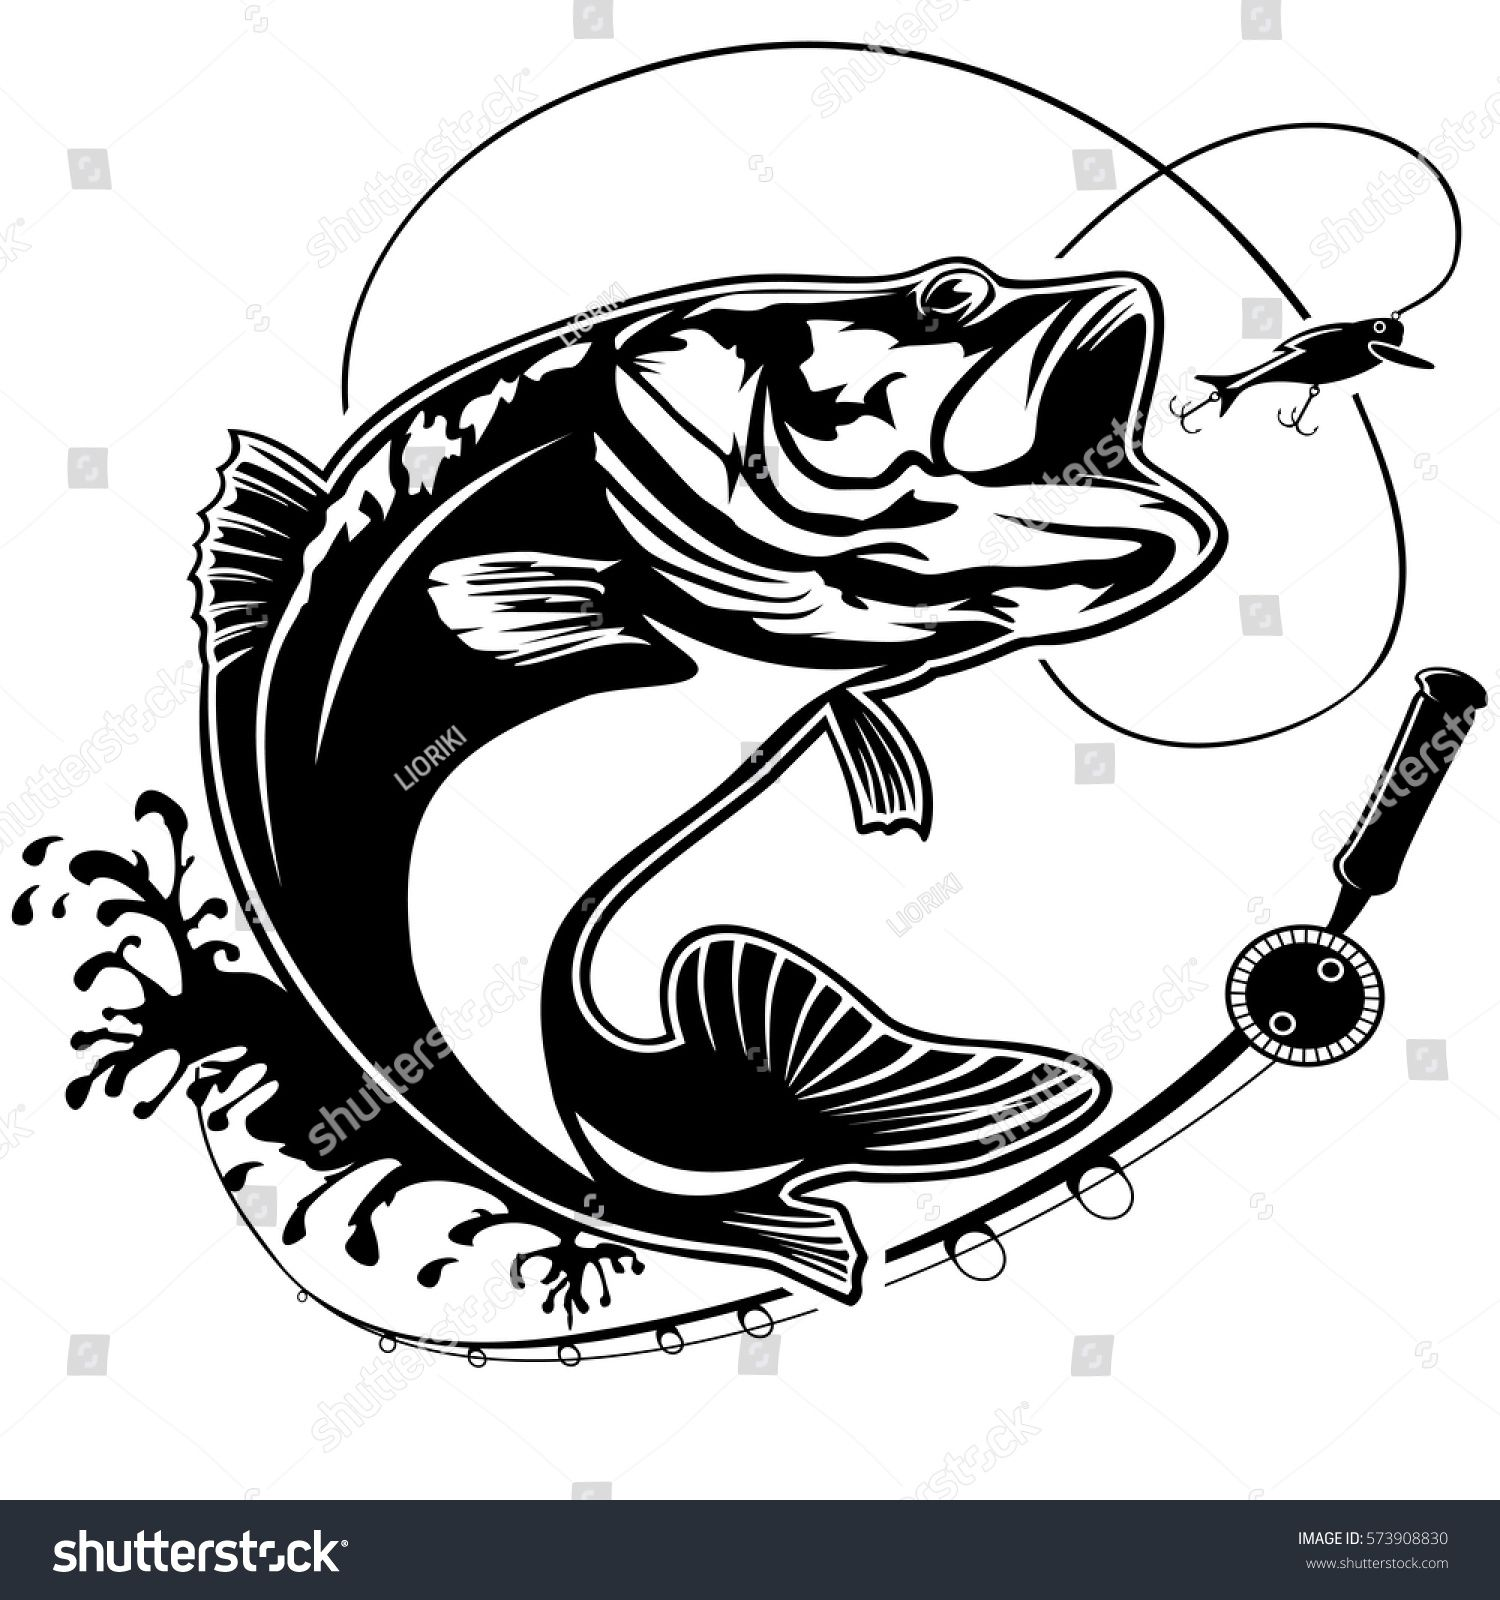 Fishing logo. Bass fish club emblem. Fishing theme vector